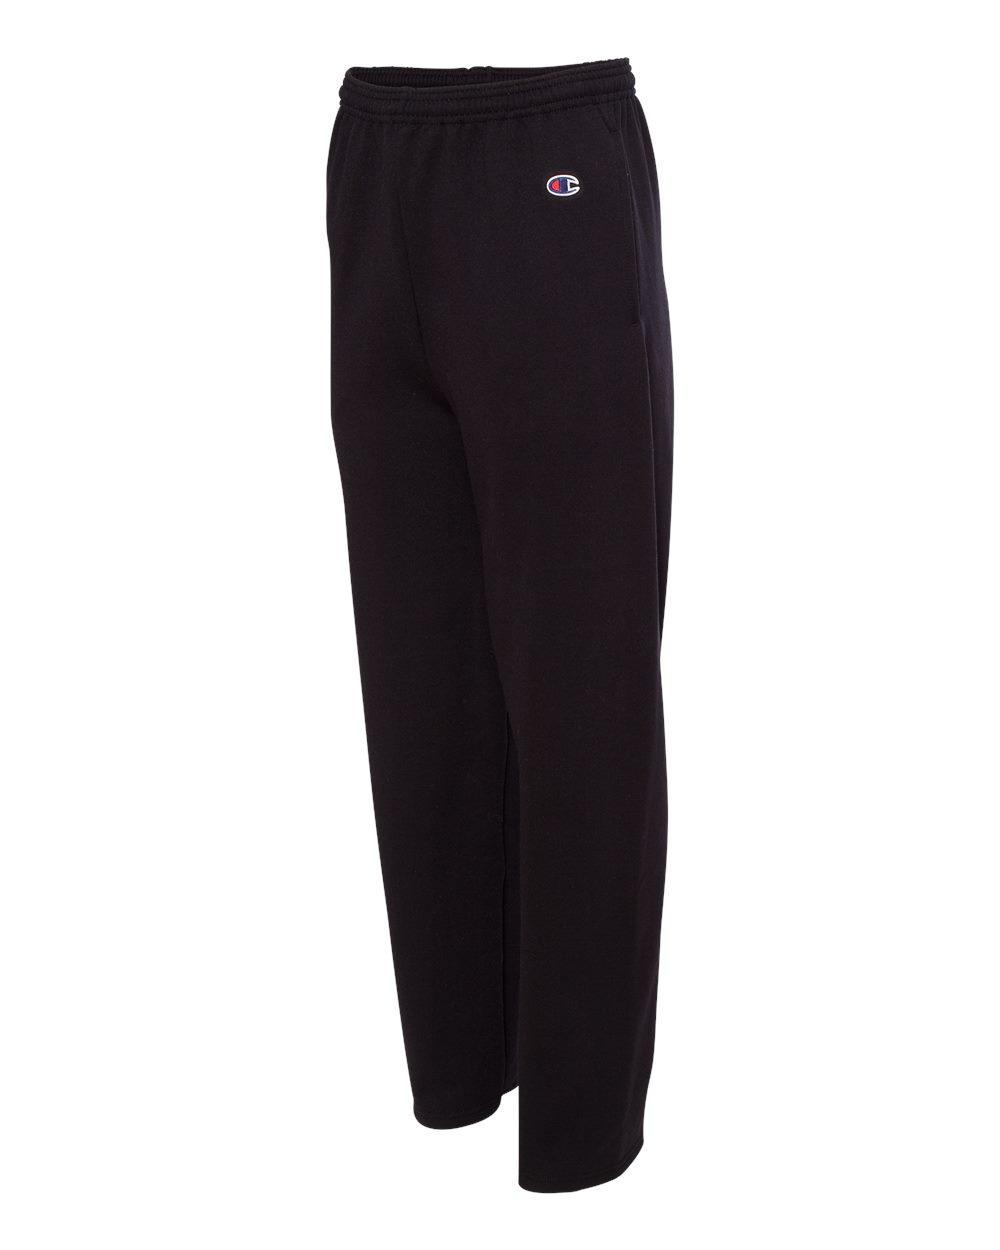 Open-Bottom Fleece Pant with Pockets P800 S-2XL Champion Men/'s Eco 9 oz